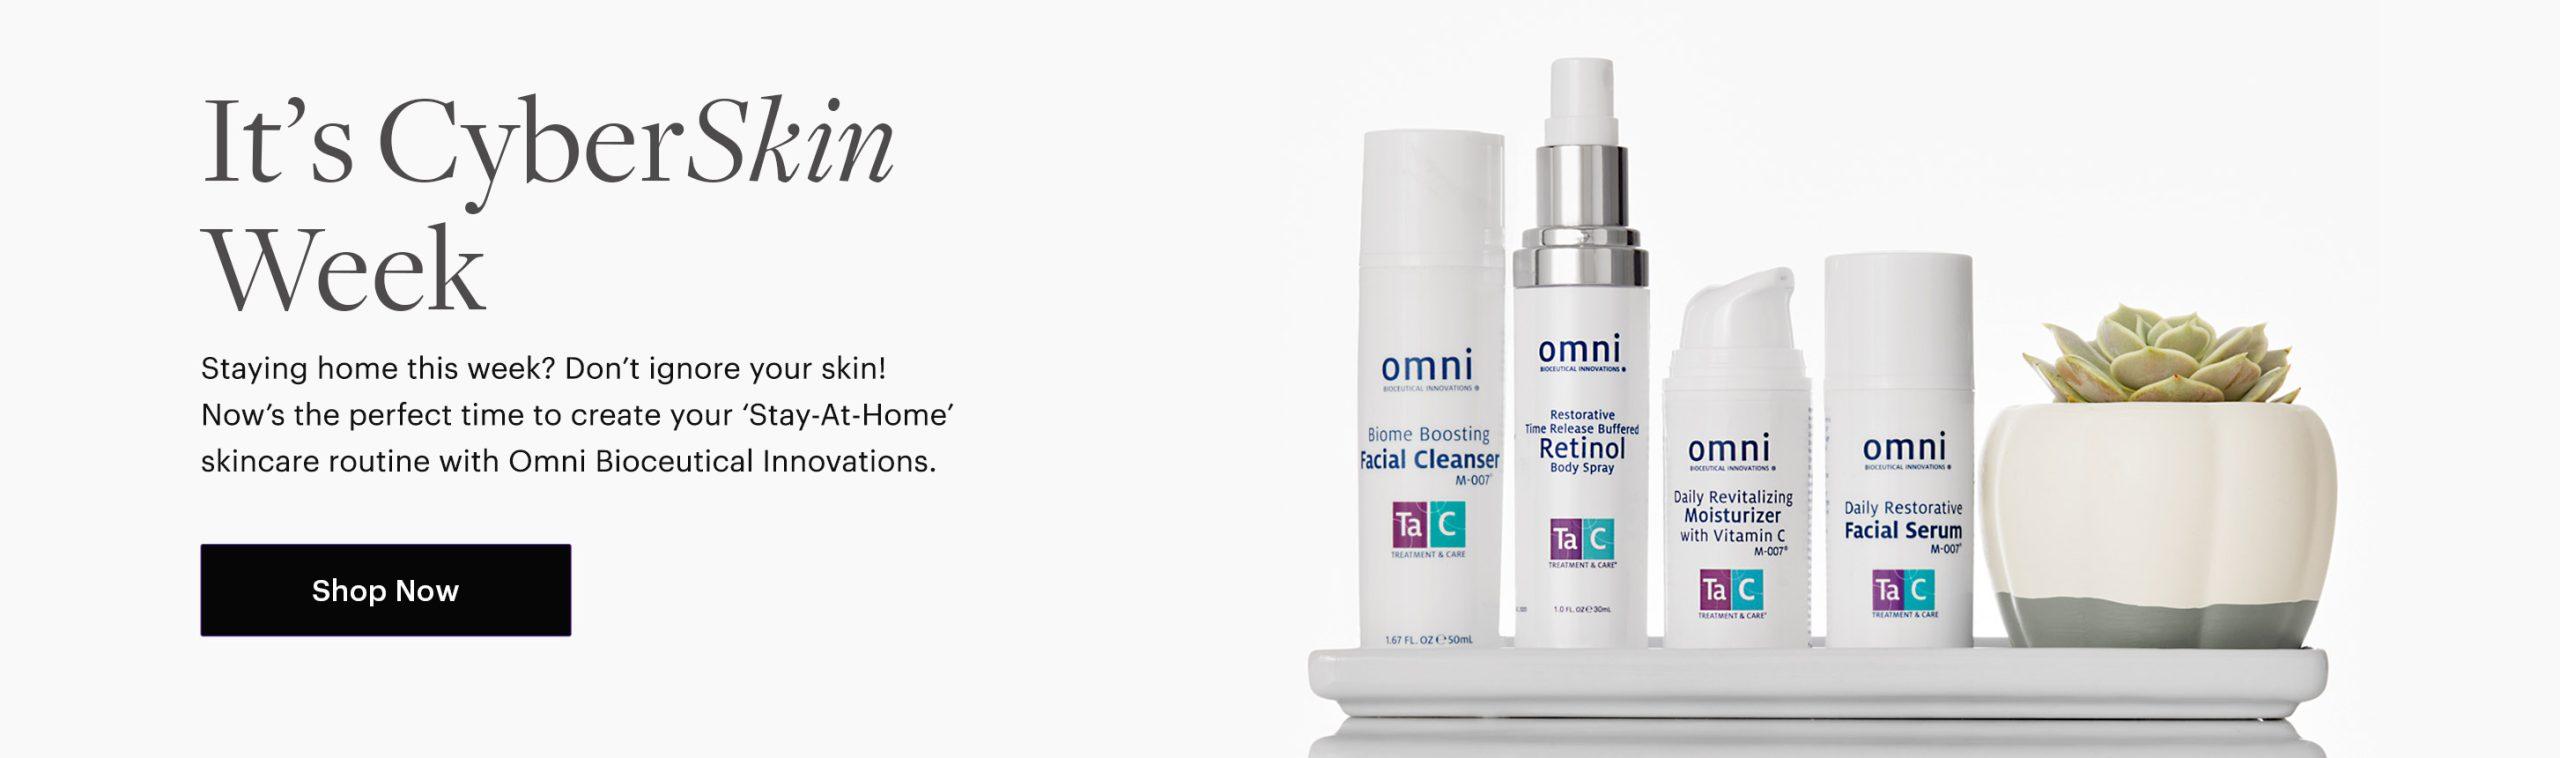 biome cleanser, retinol, vitamin c moisturizer, facial serum, m-007